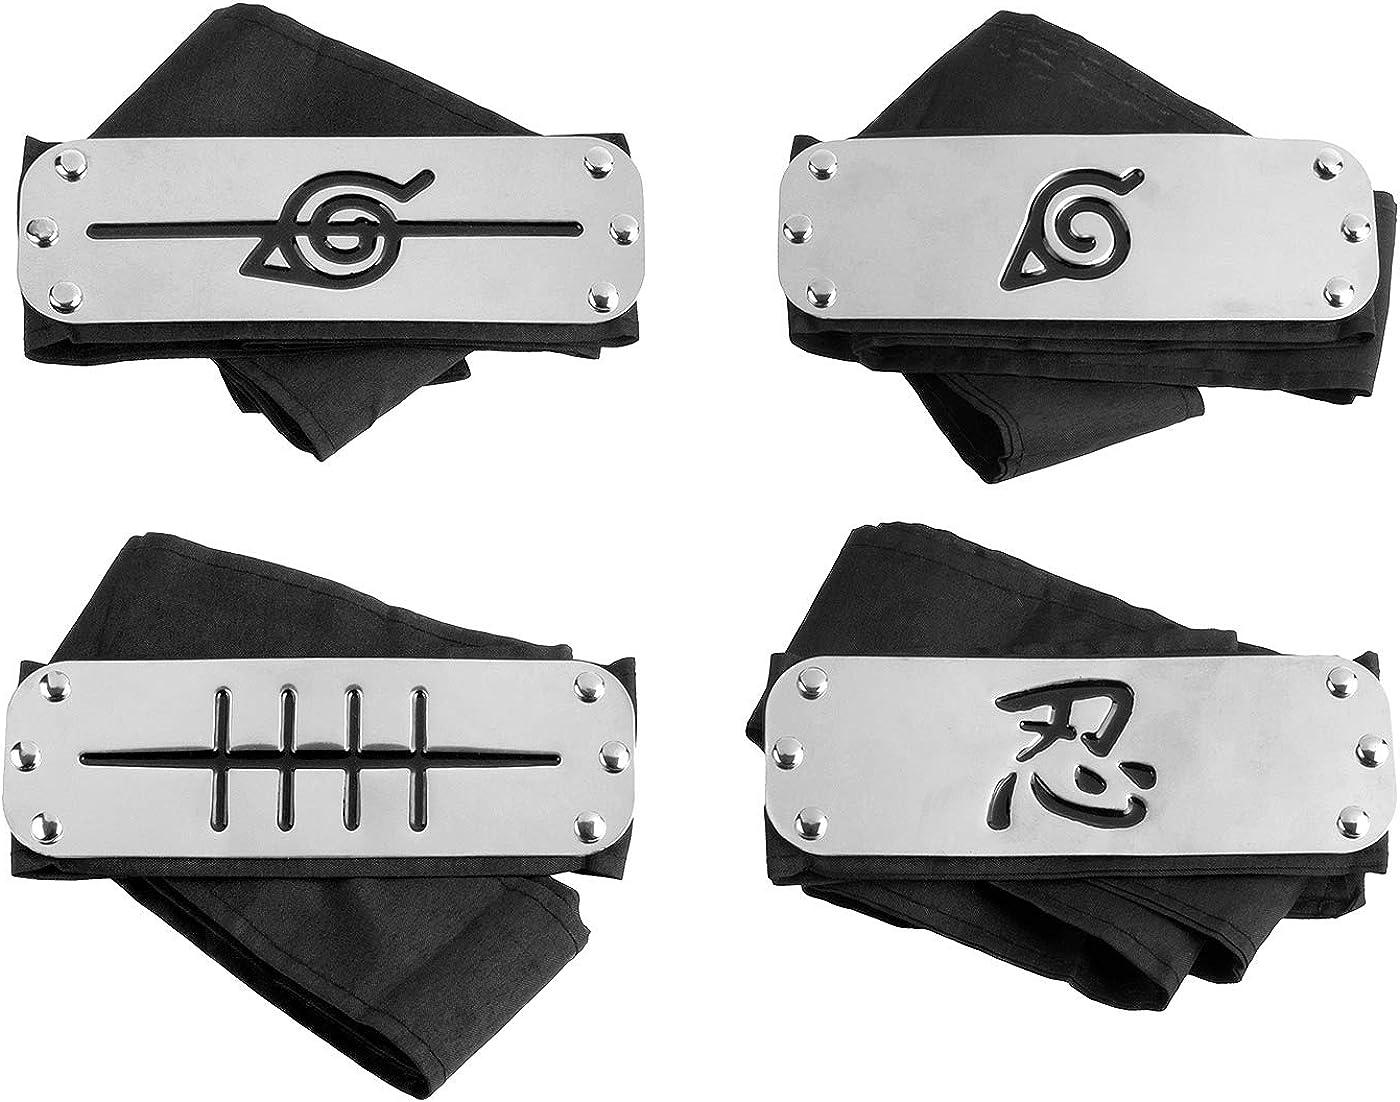 4 Pack Naruto Headband Metal Plate Japanese Naruto Headband Leaf Village Headband for Cosplay (Black)